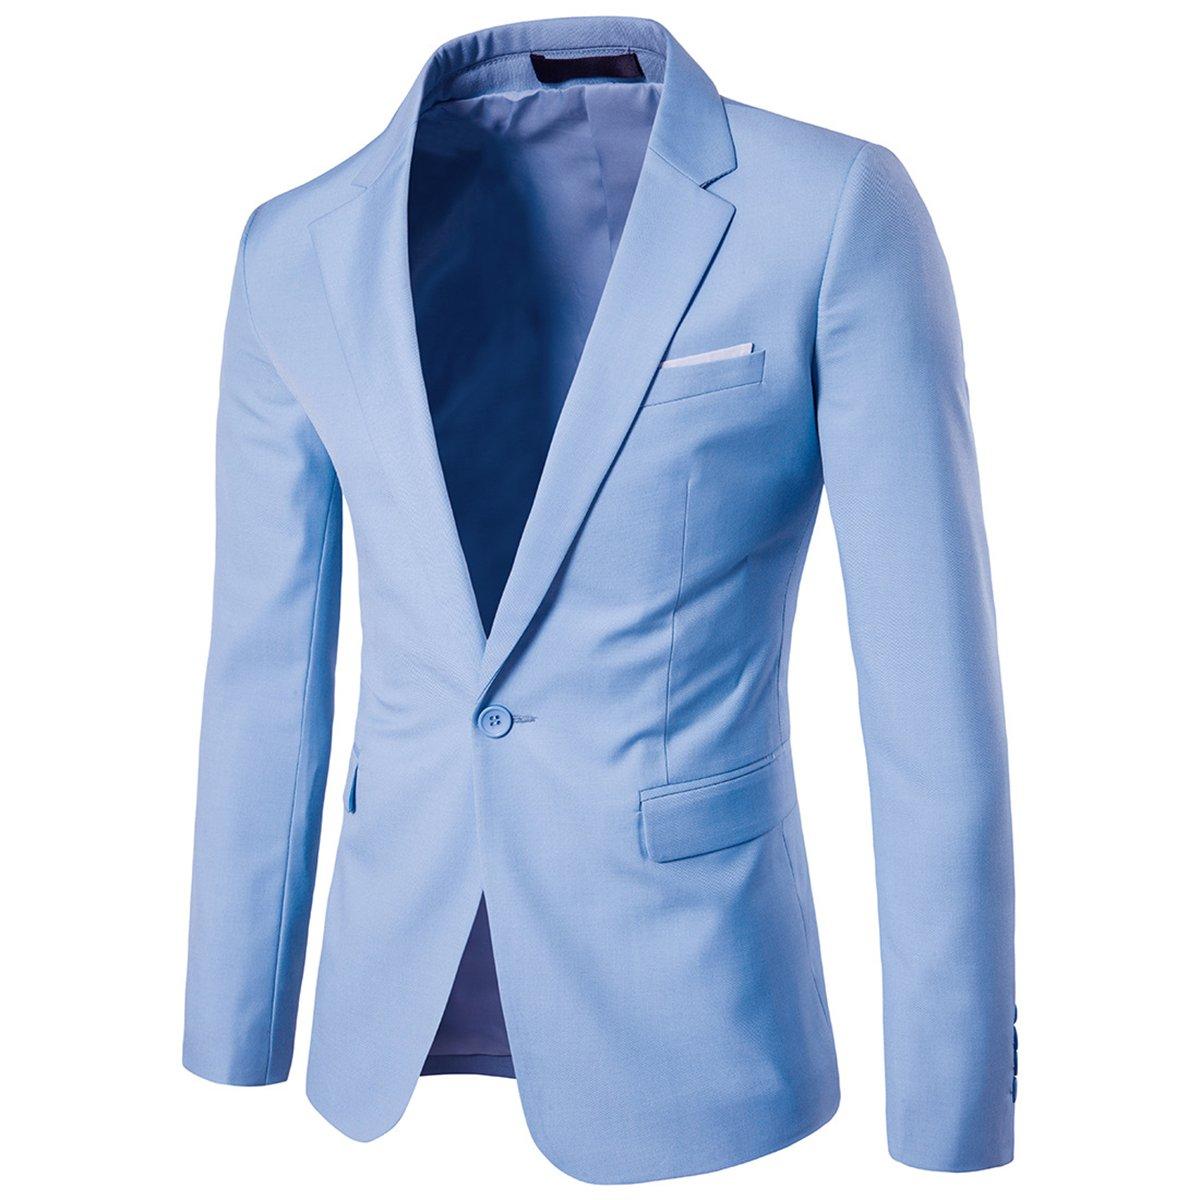 1960s -1970s Men's Clothing Mens Suit Jacket One Button Slim Fit Sport Coat Business Daily Blazer $47.99 AT vintagedancer.com